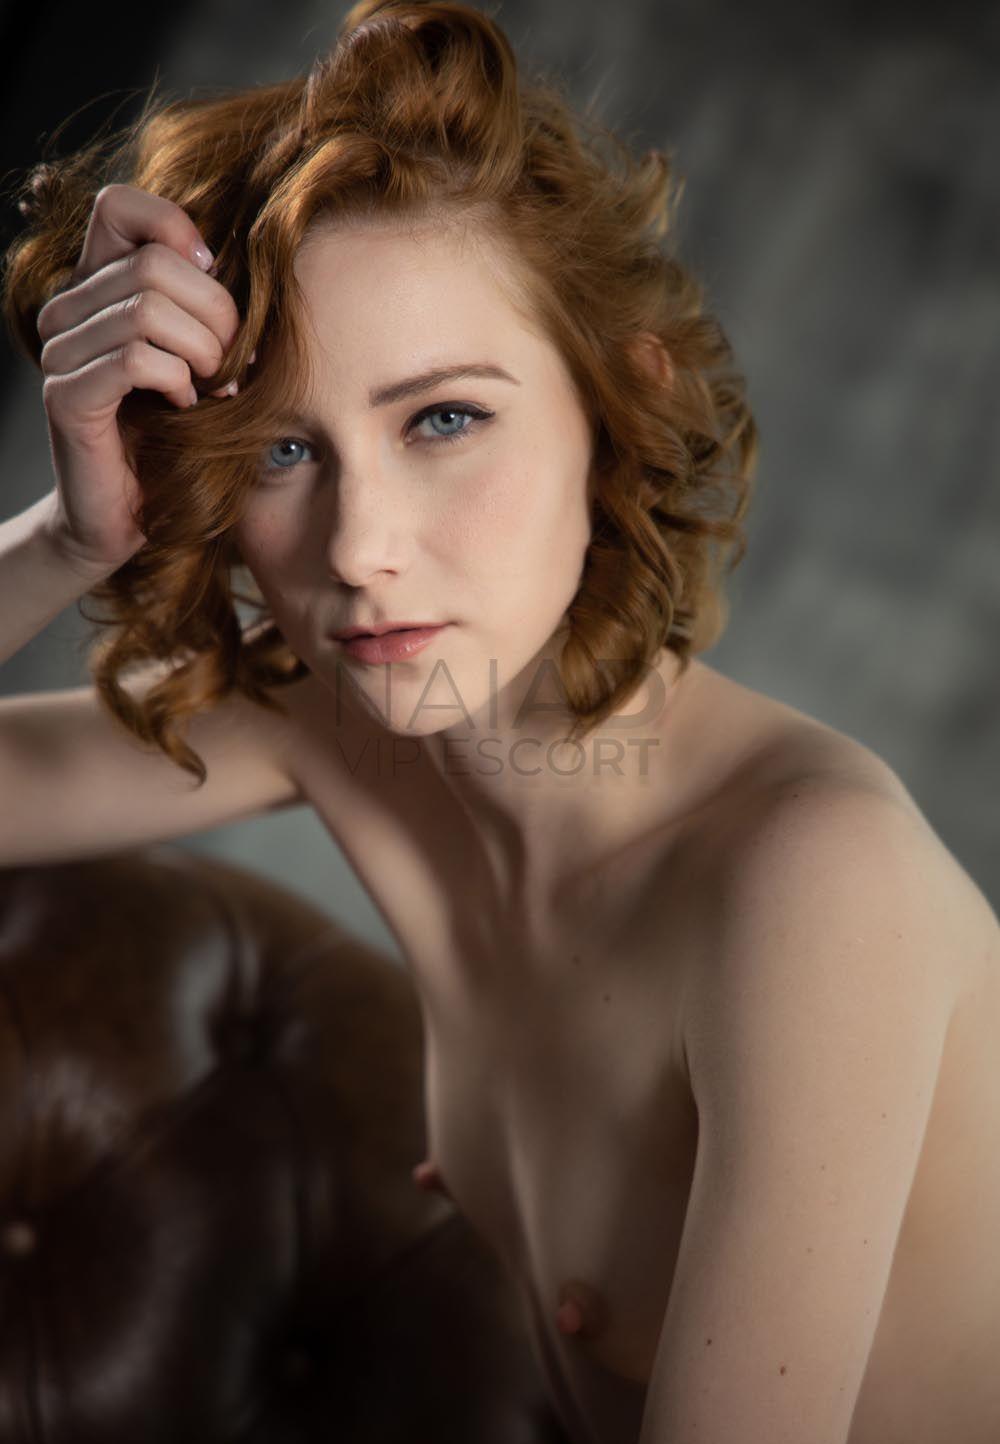 Photo of Sabina on Naiad vip escort service in Paris